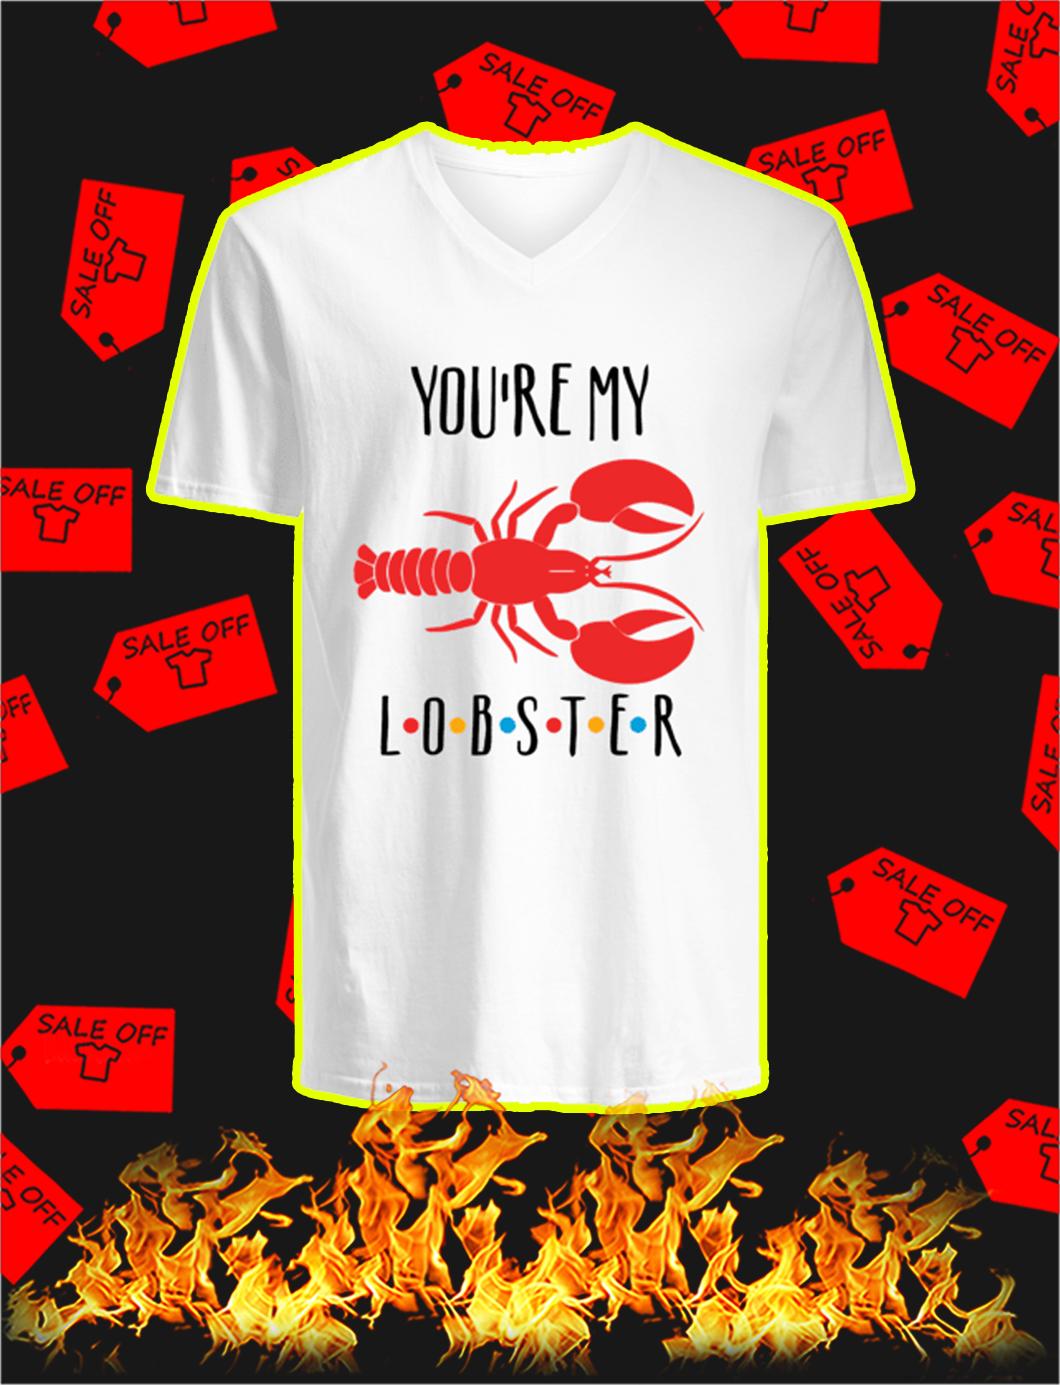 You're My Lobster v-neck